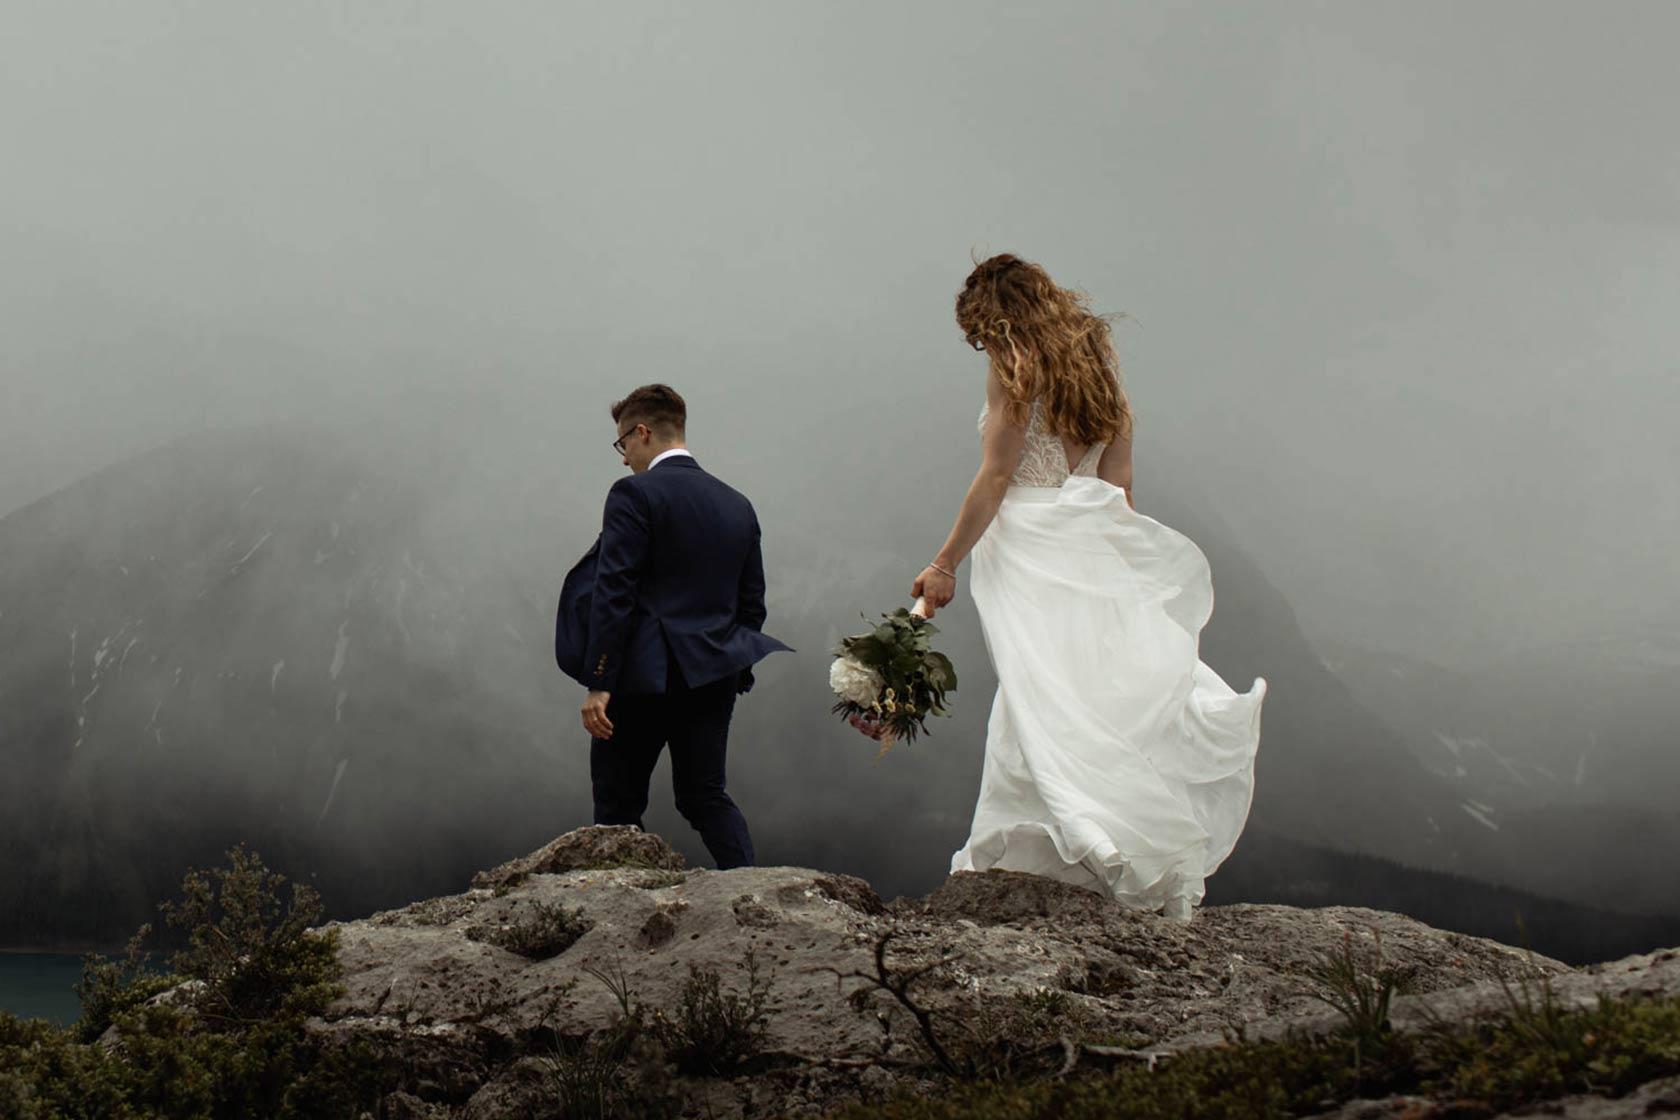 Kananaskis-Hiking-Elopement-Photographers-19-1